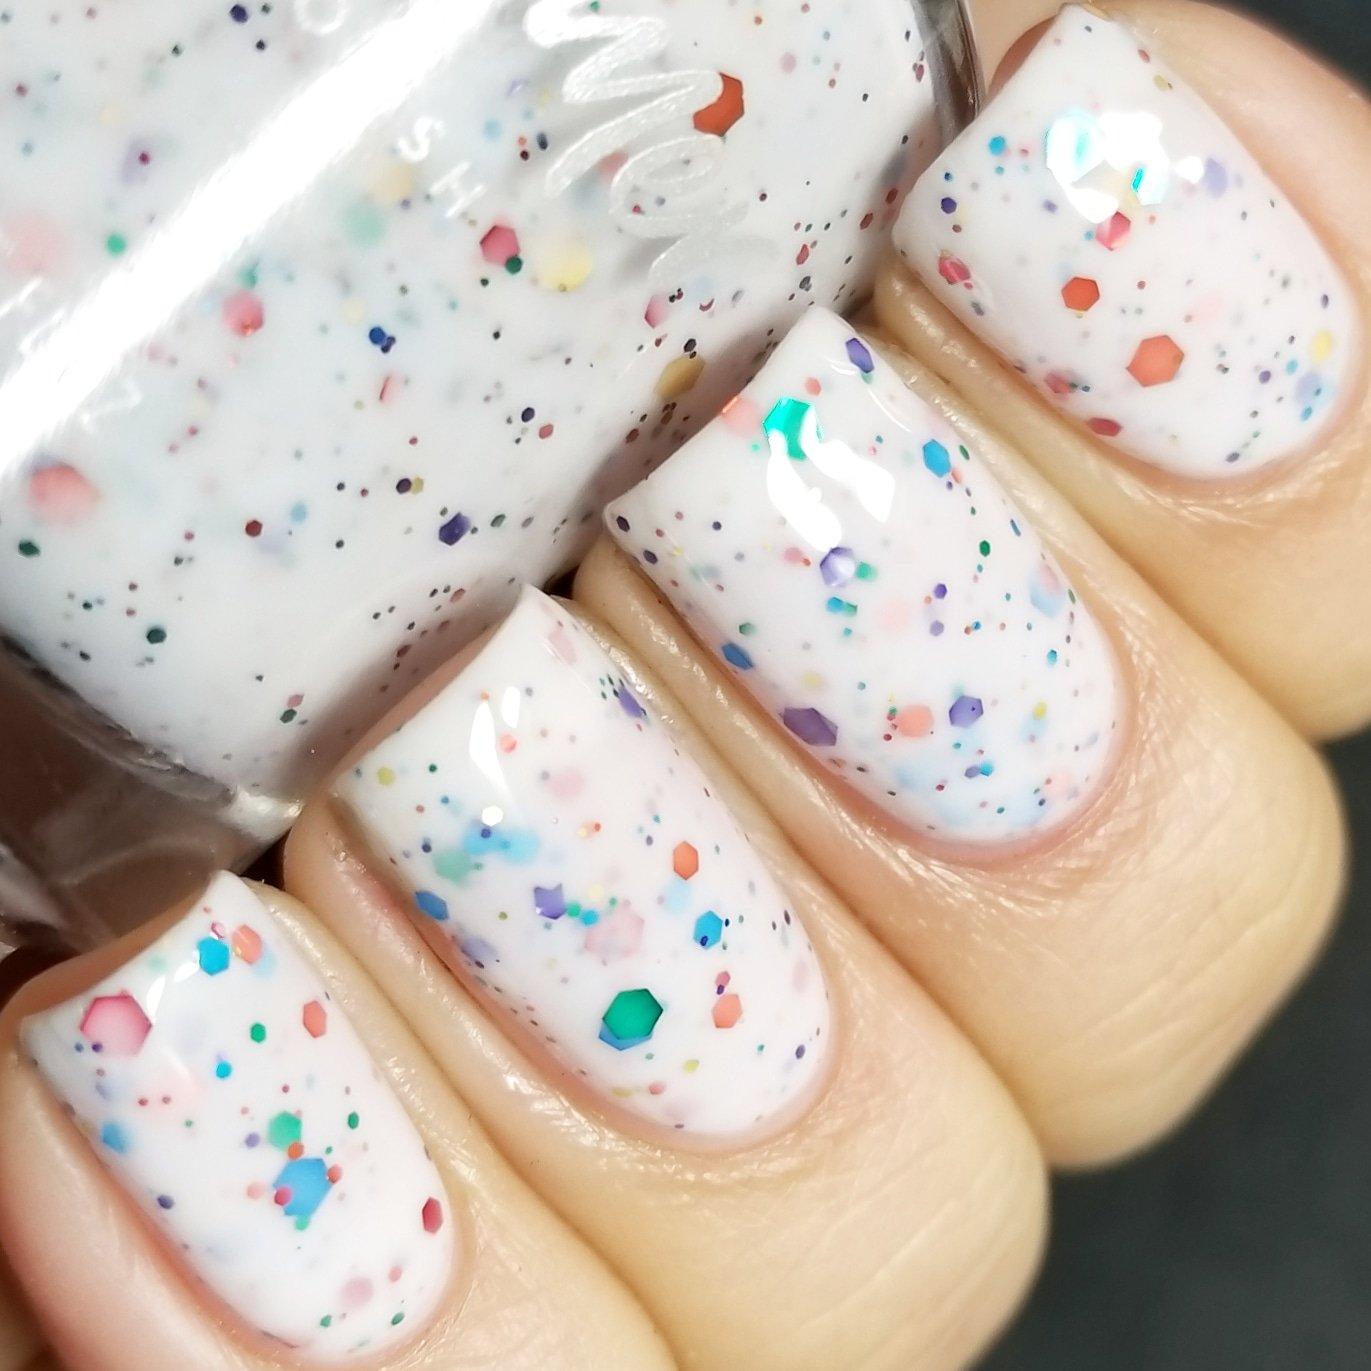 Amazon.com : Oh Splat White Glitter Nail Polish with Rainbow ...